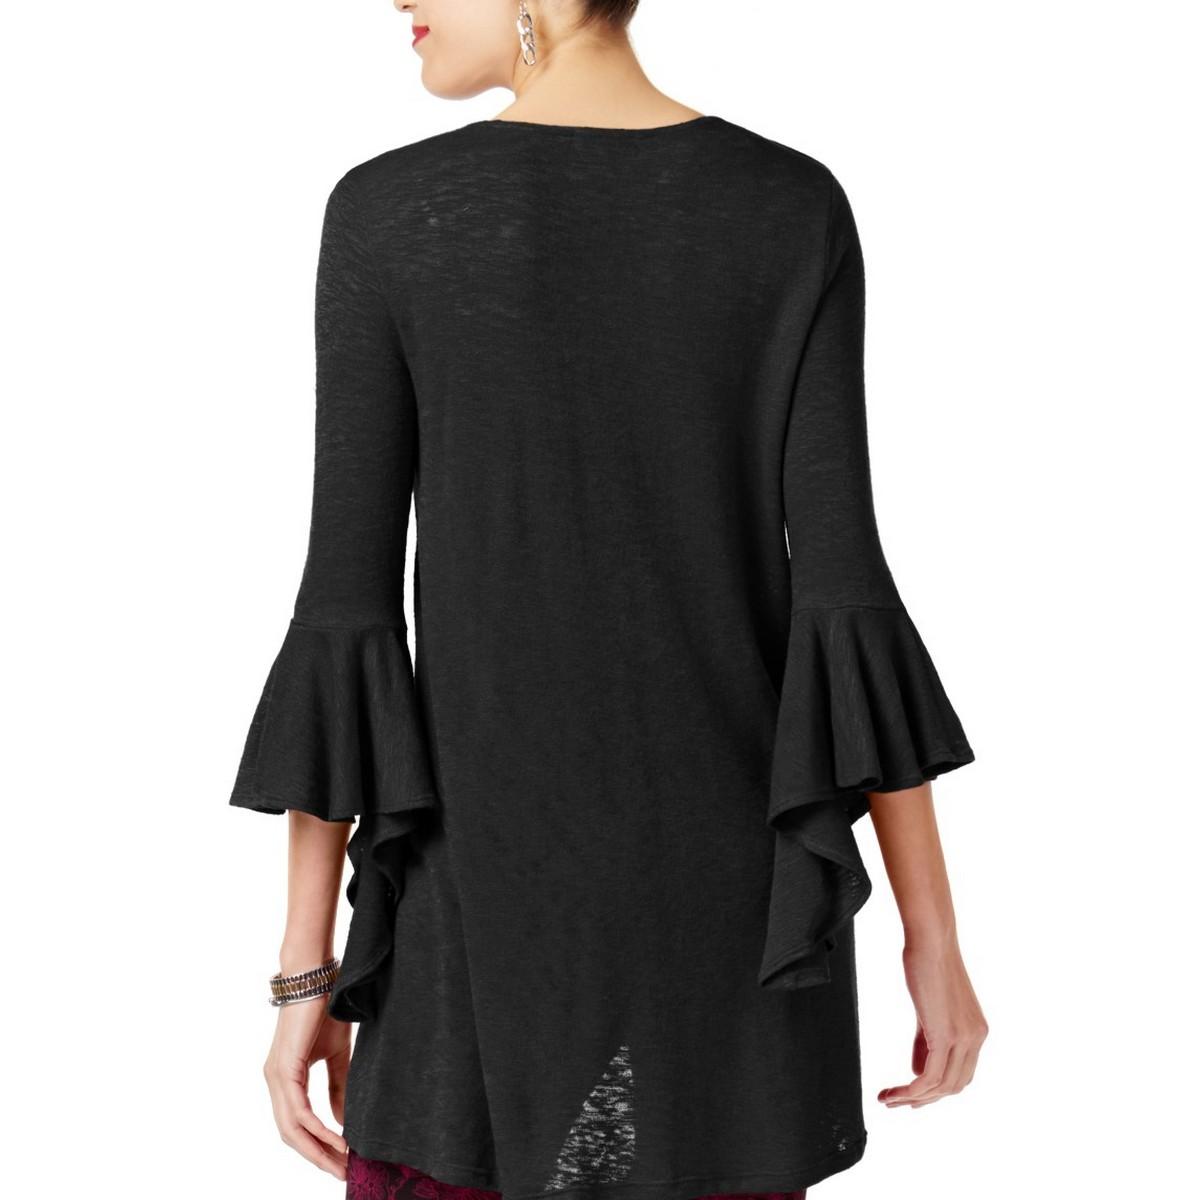 ALFANI-NEW-Women-039-s-High-low-Bell-sleeve-Knit-Tunic-Shirt-Top-TEDO thumbnail 3